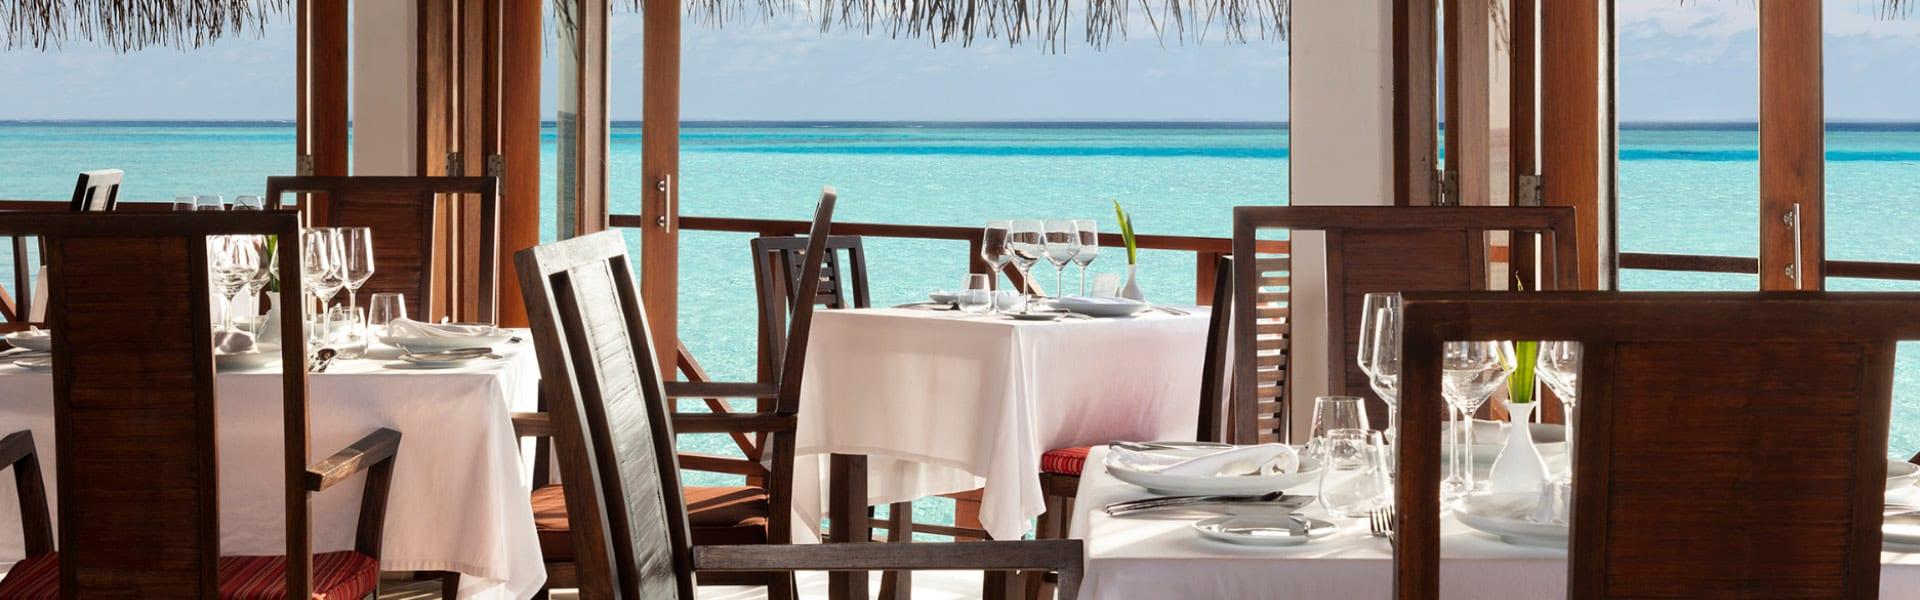 Italian Restaurant In Maldives Italian At Anantara Dhigu